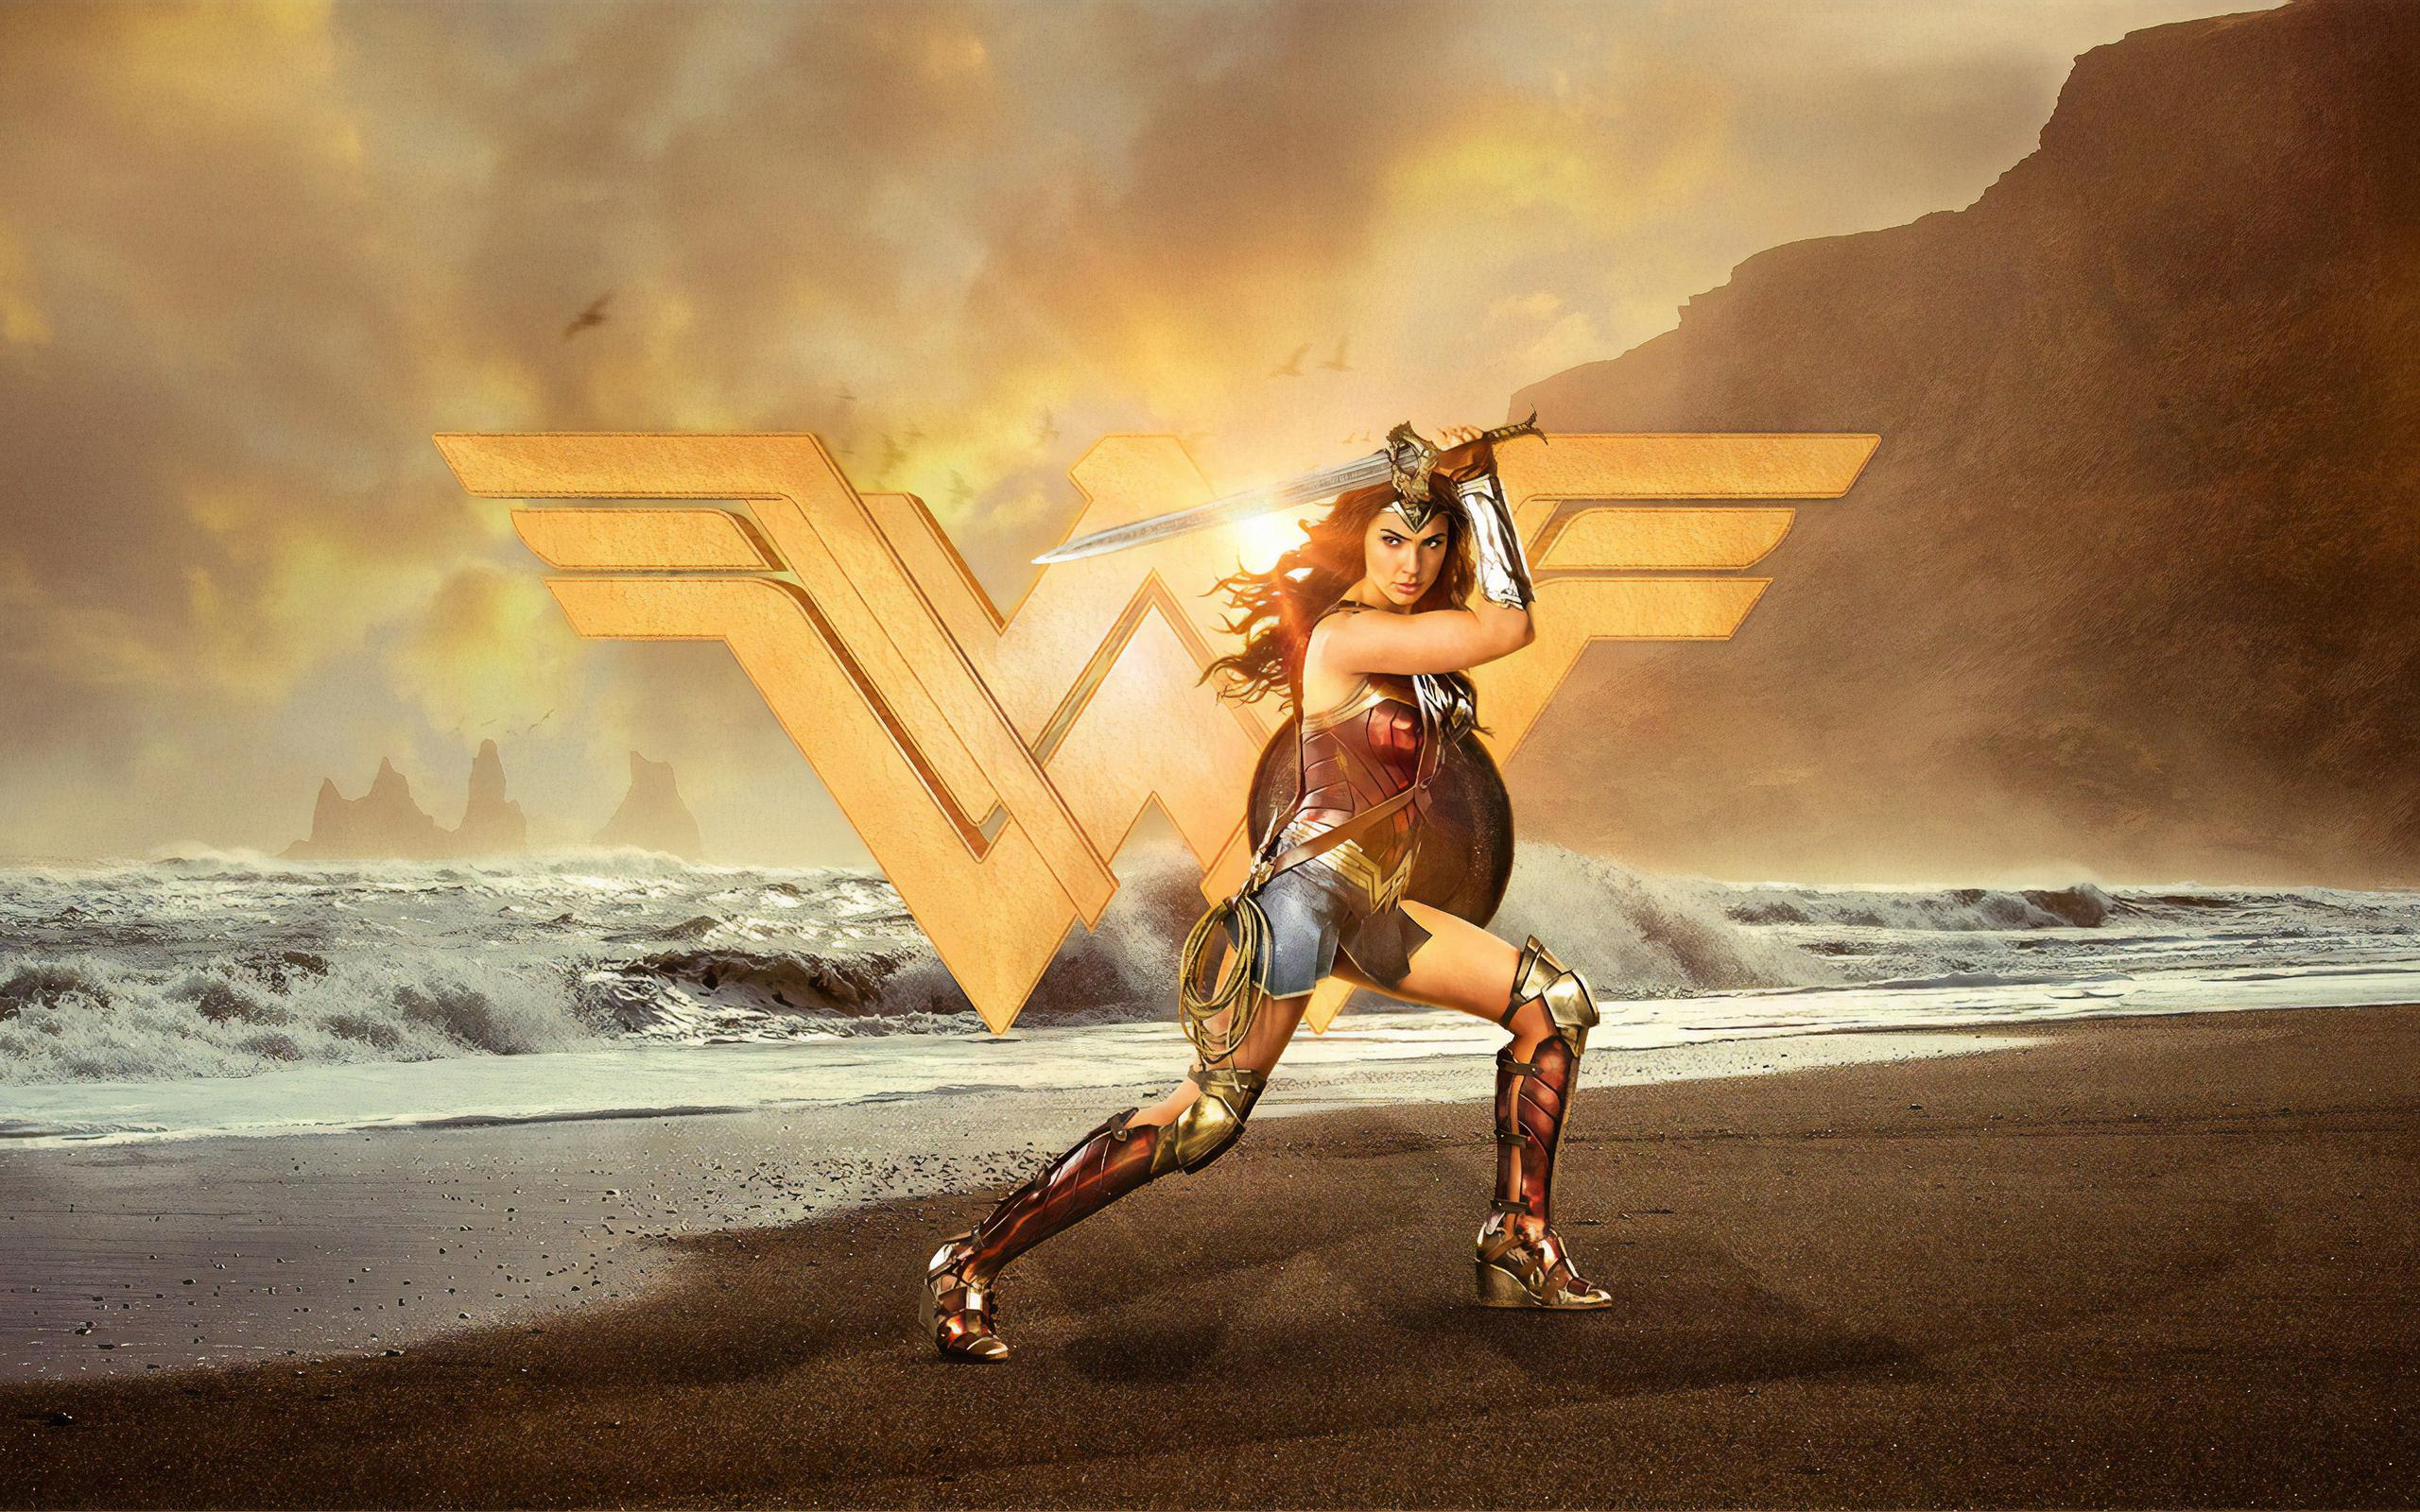 wonder-woman4k-gal-gadot-p0.jpg